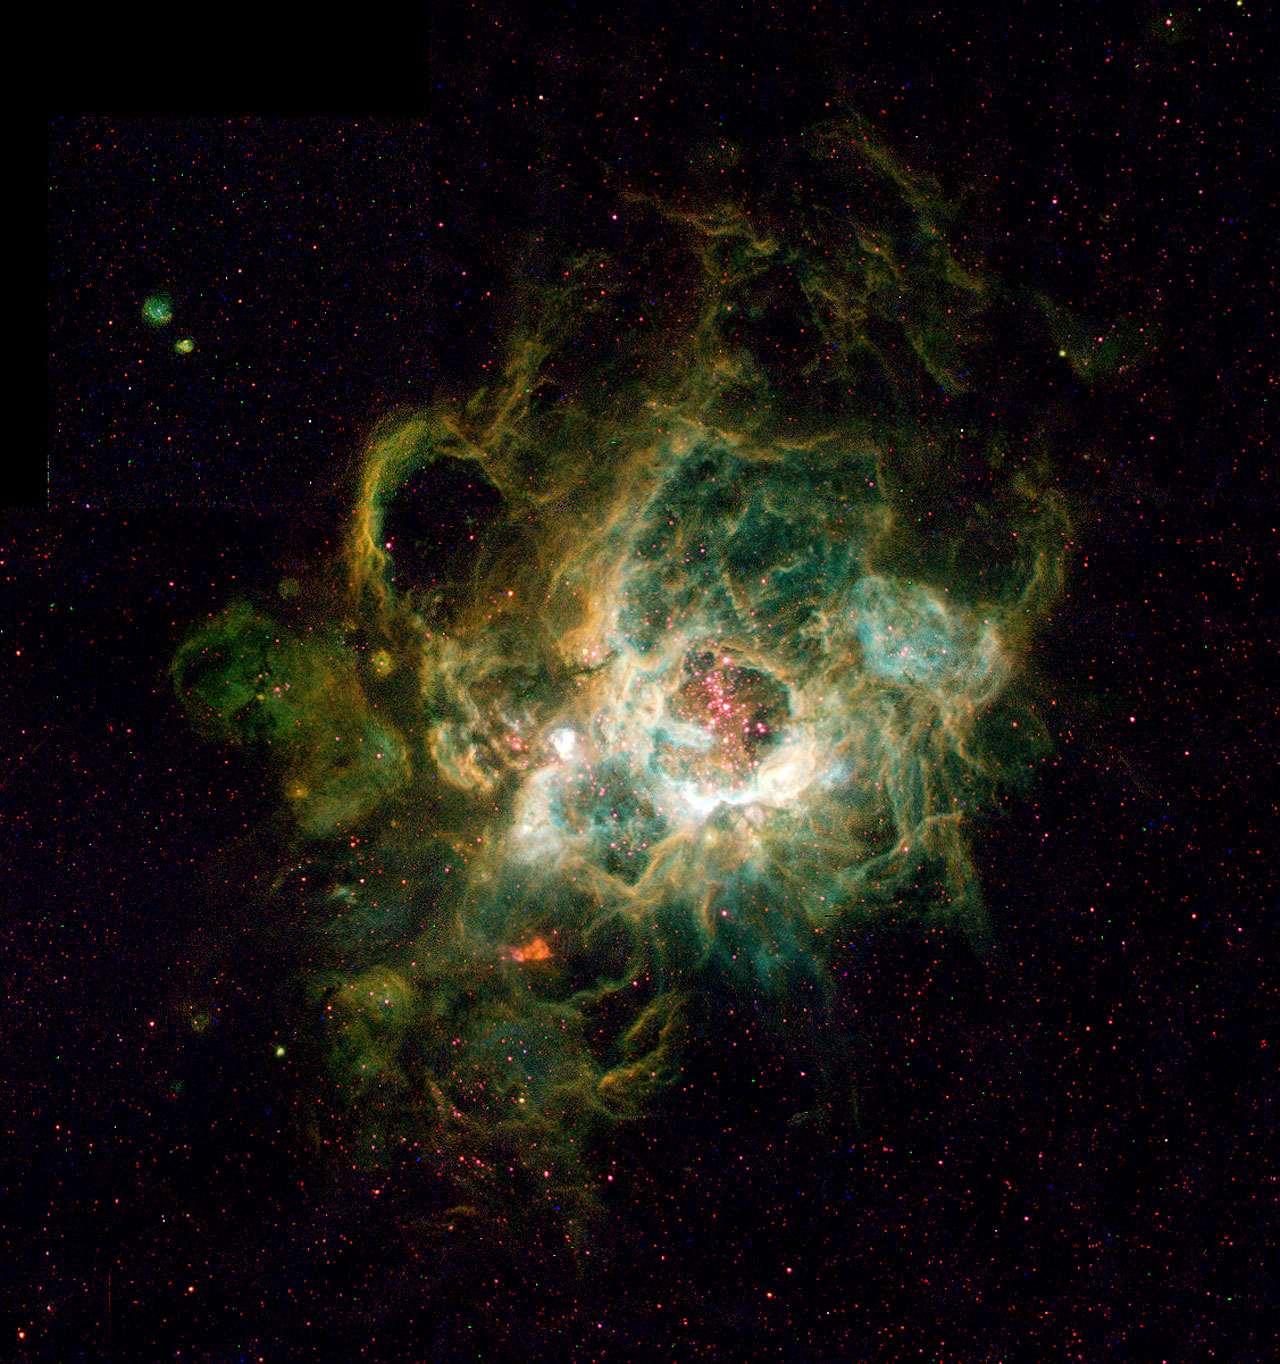 hubble telescope constellation - photo #35